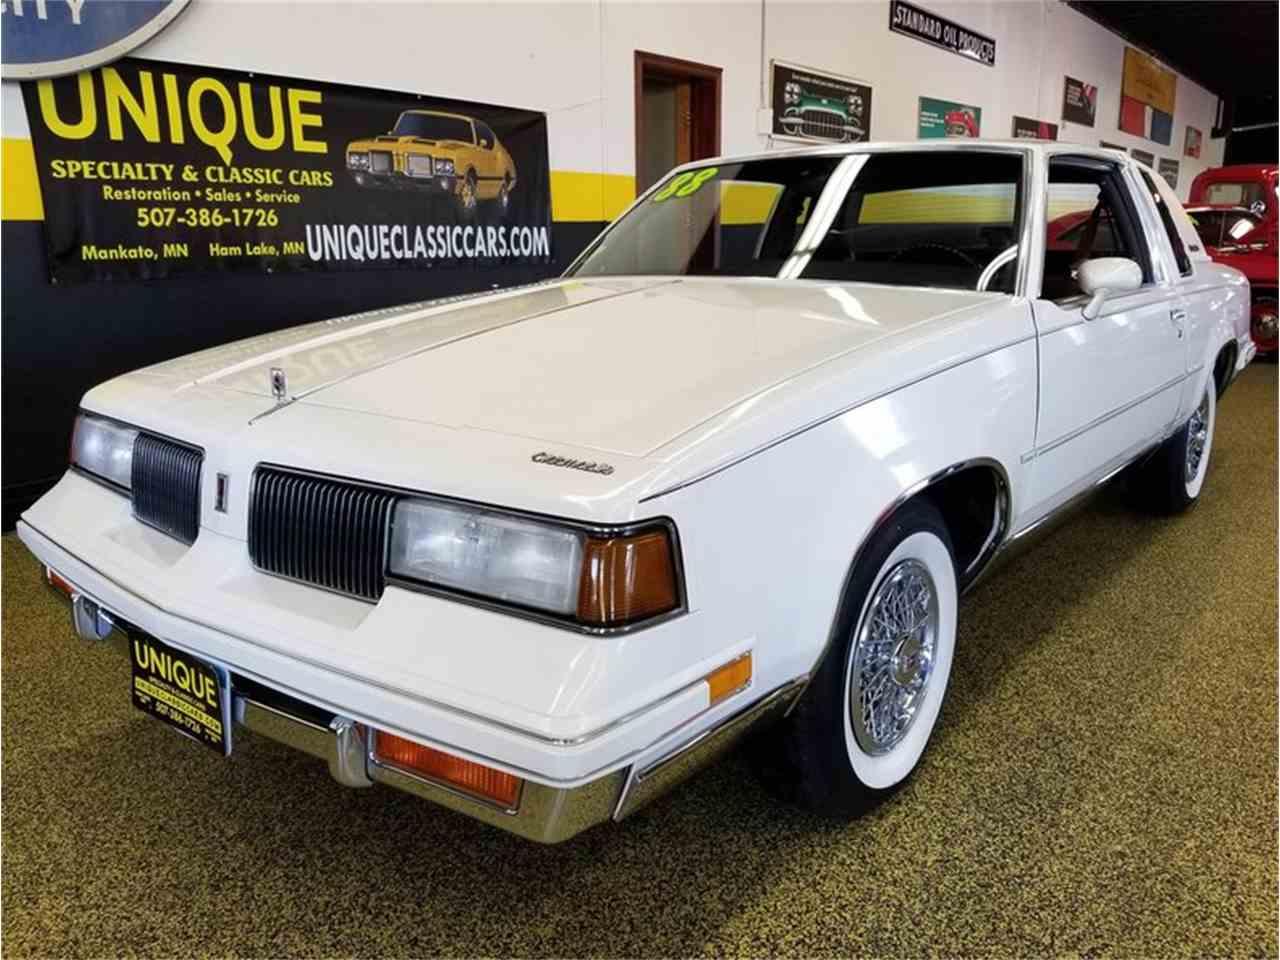 1988 Oldsmobile Cutlass Supreme for Sale | ClassicCars.com | CC-1080953